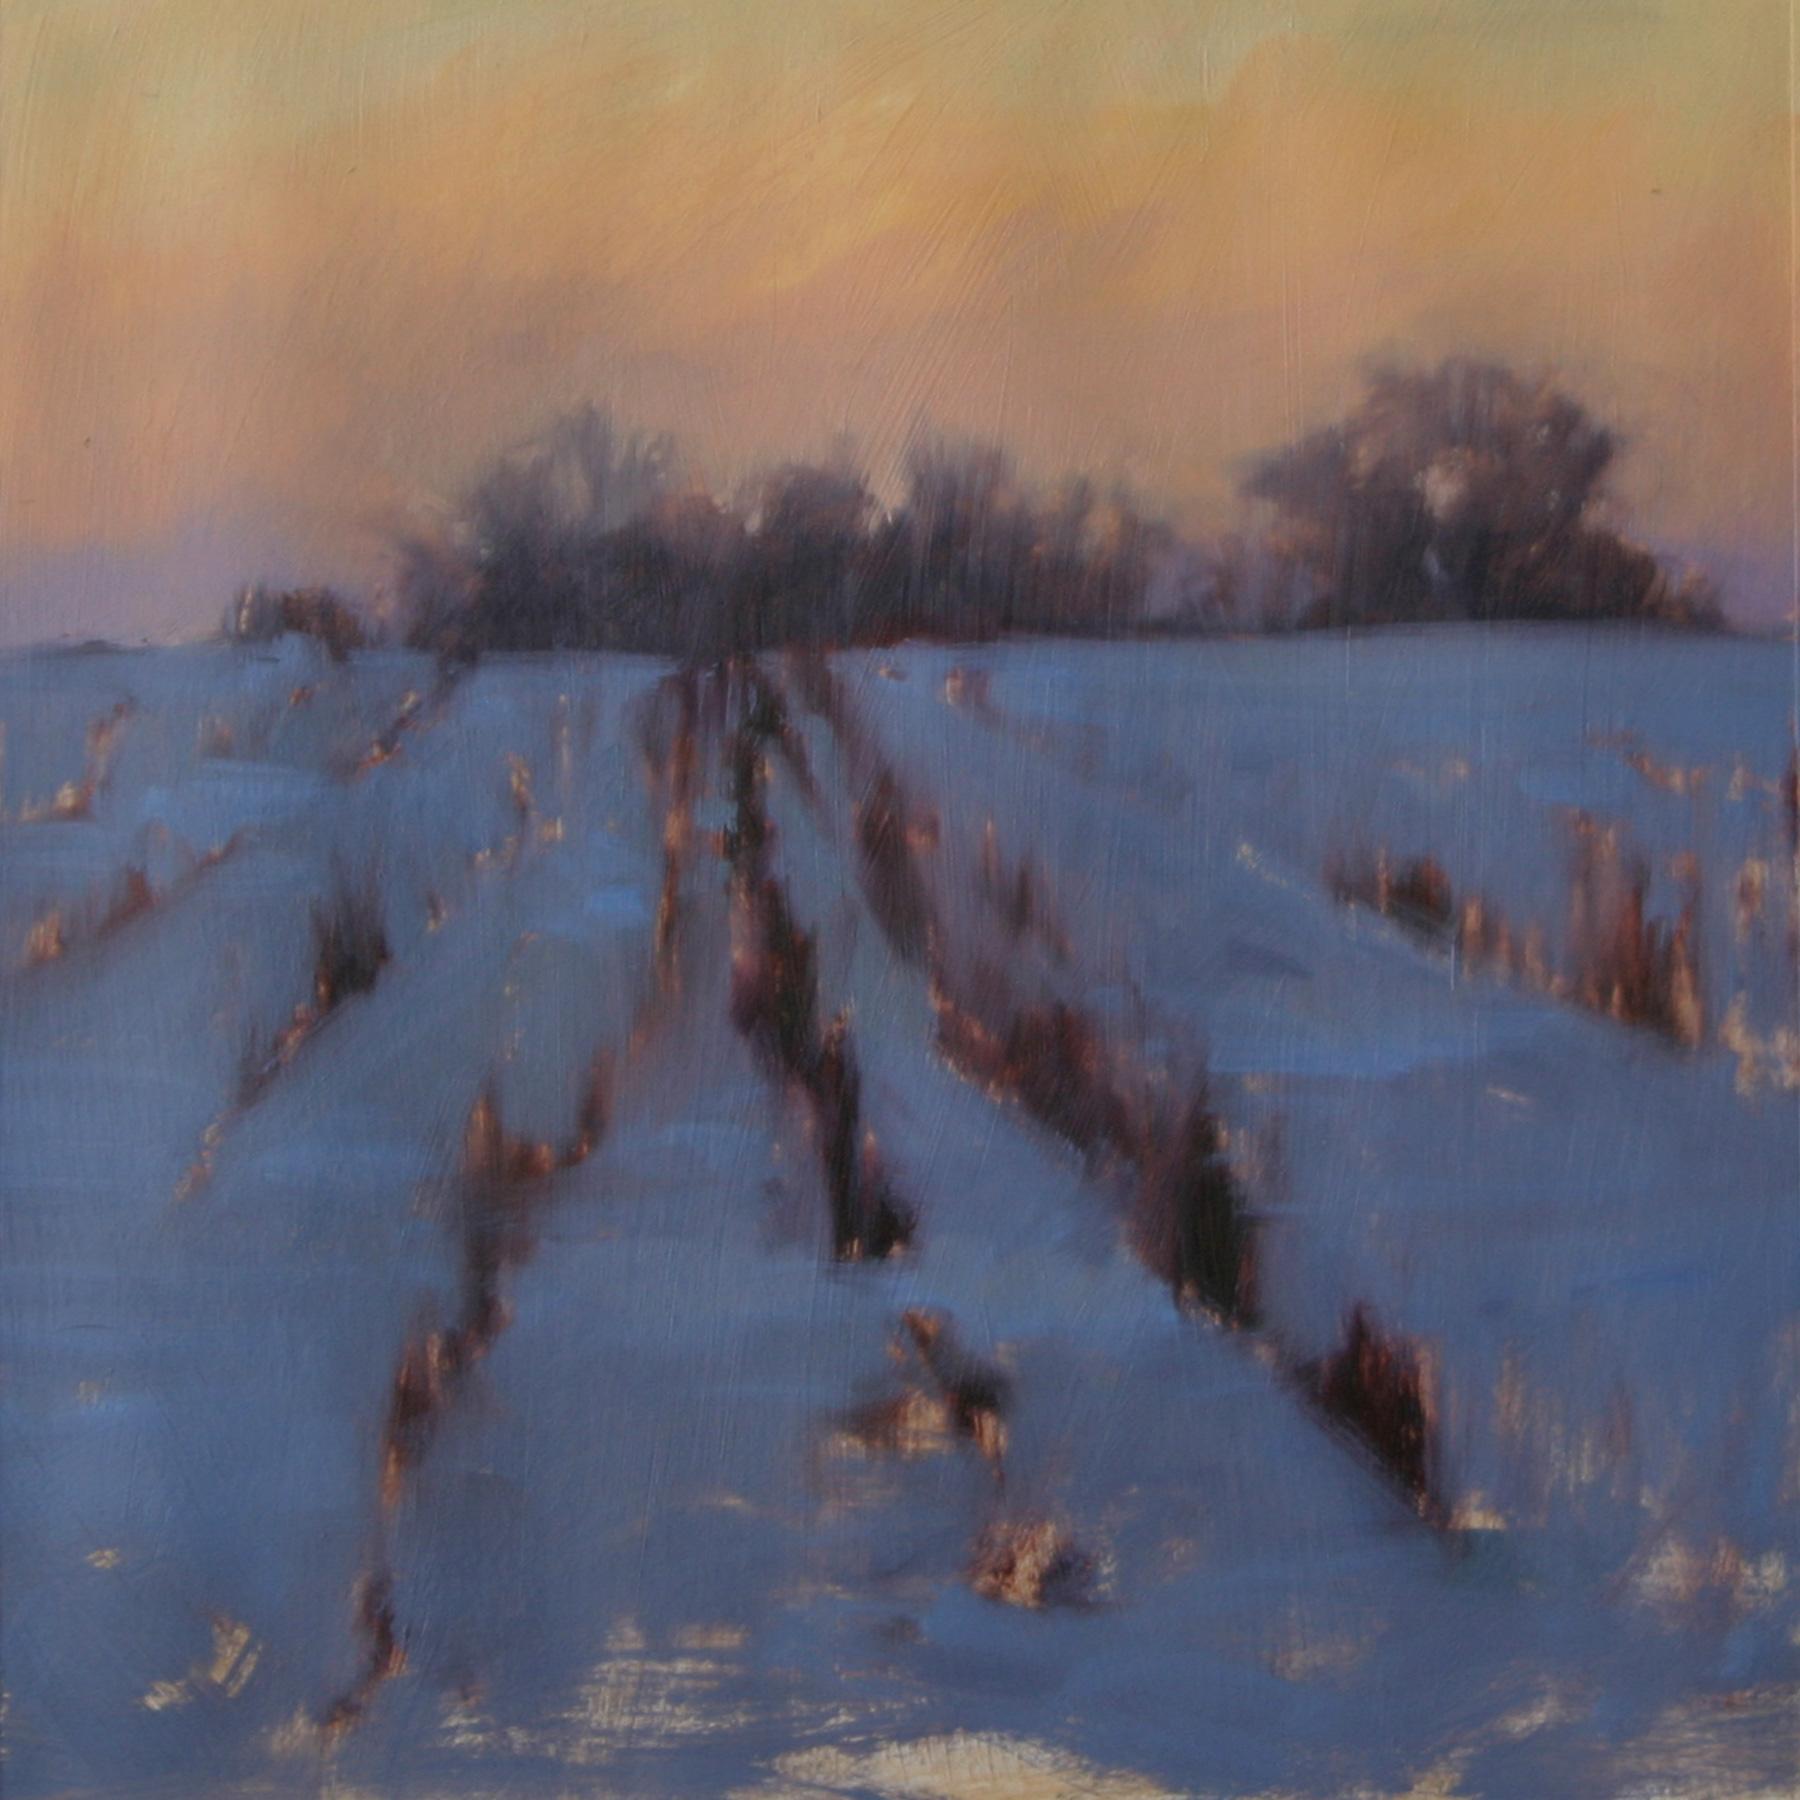 Winter study (field), oil on paper, 10 x 10